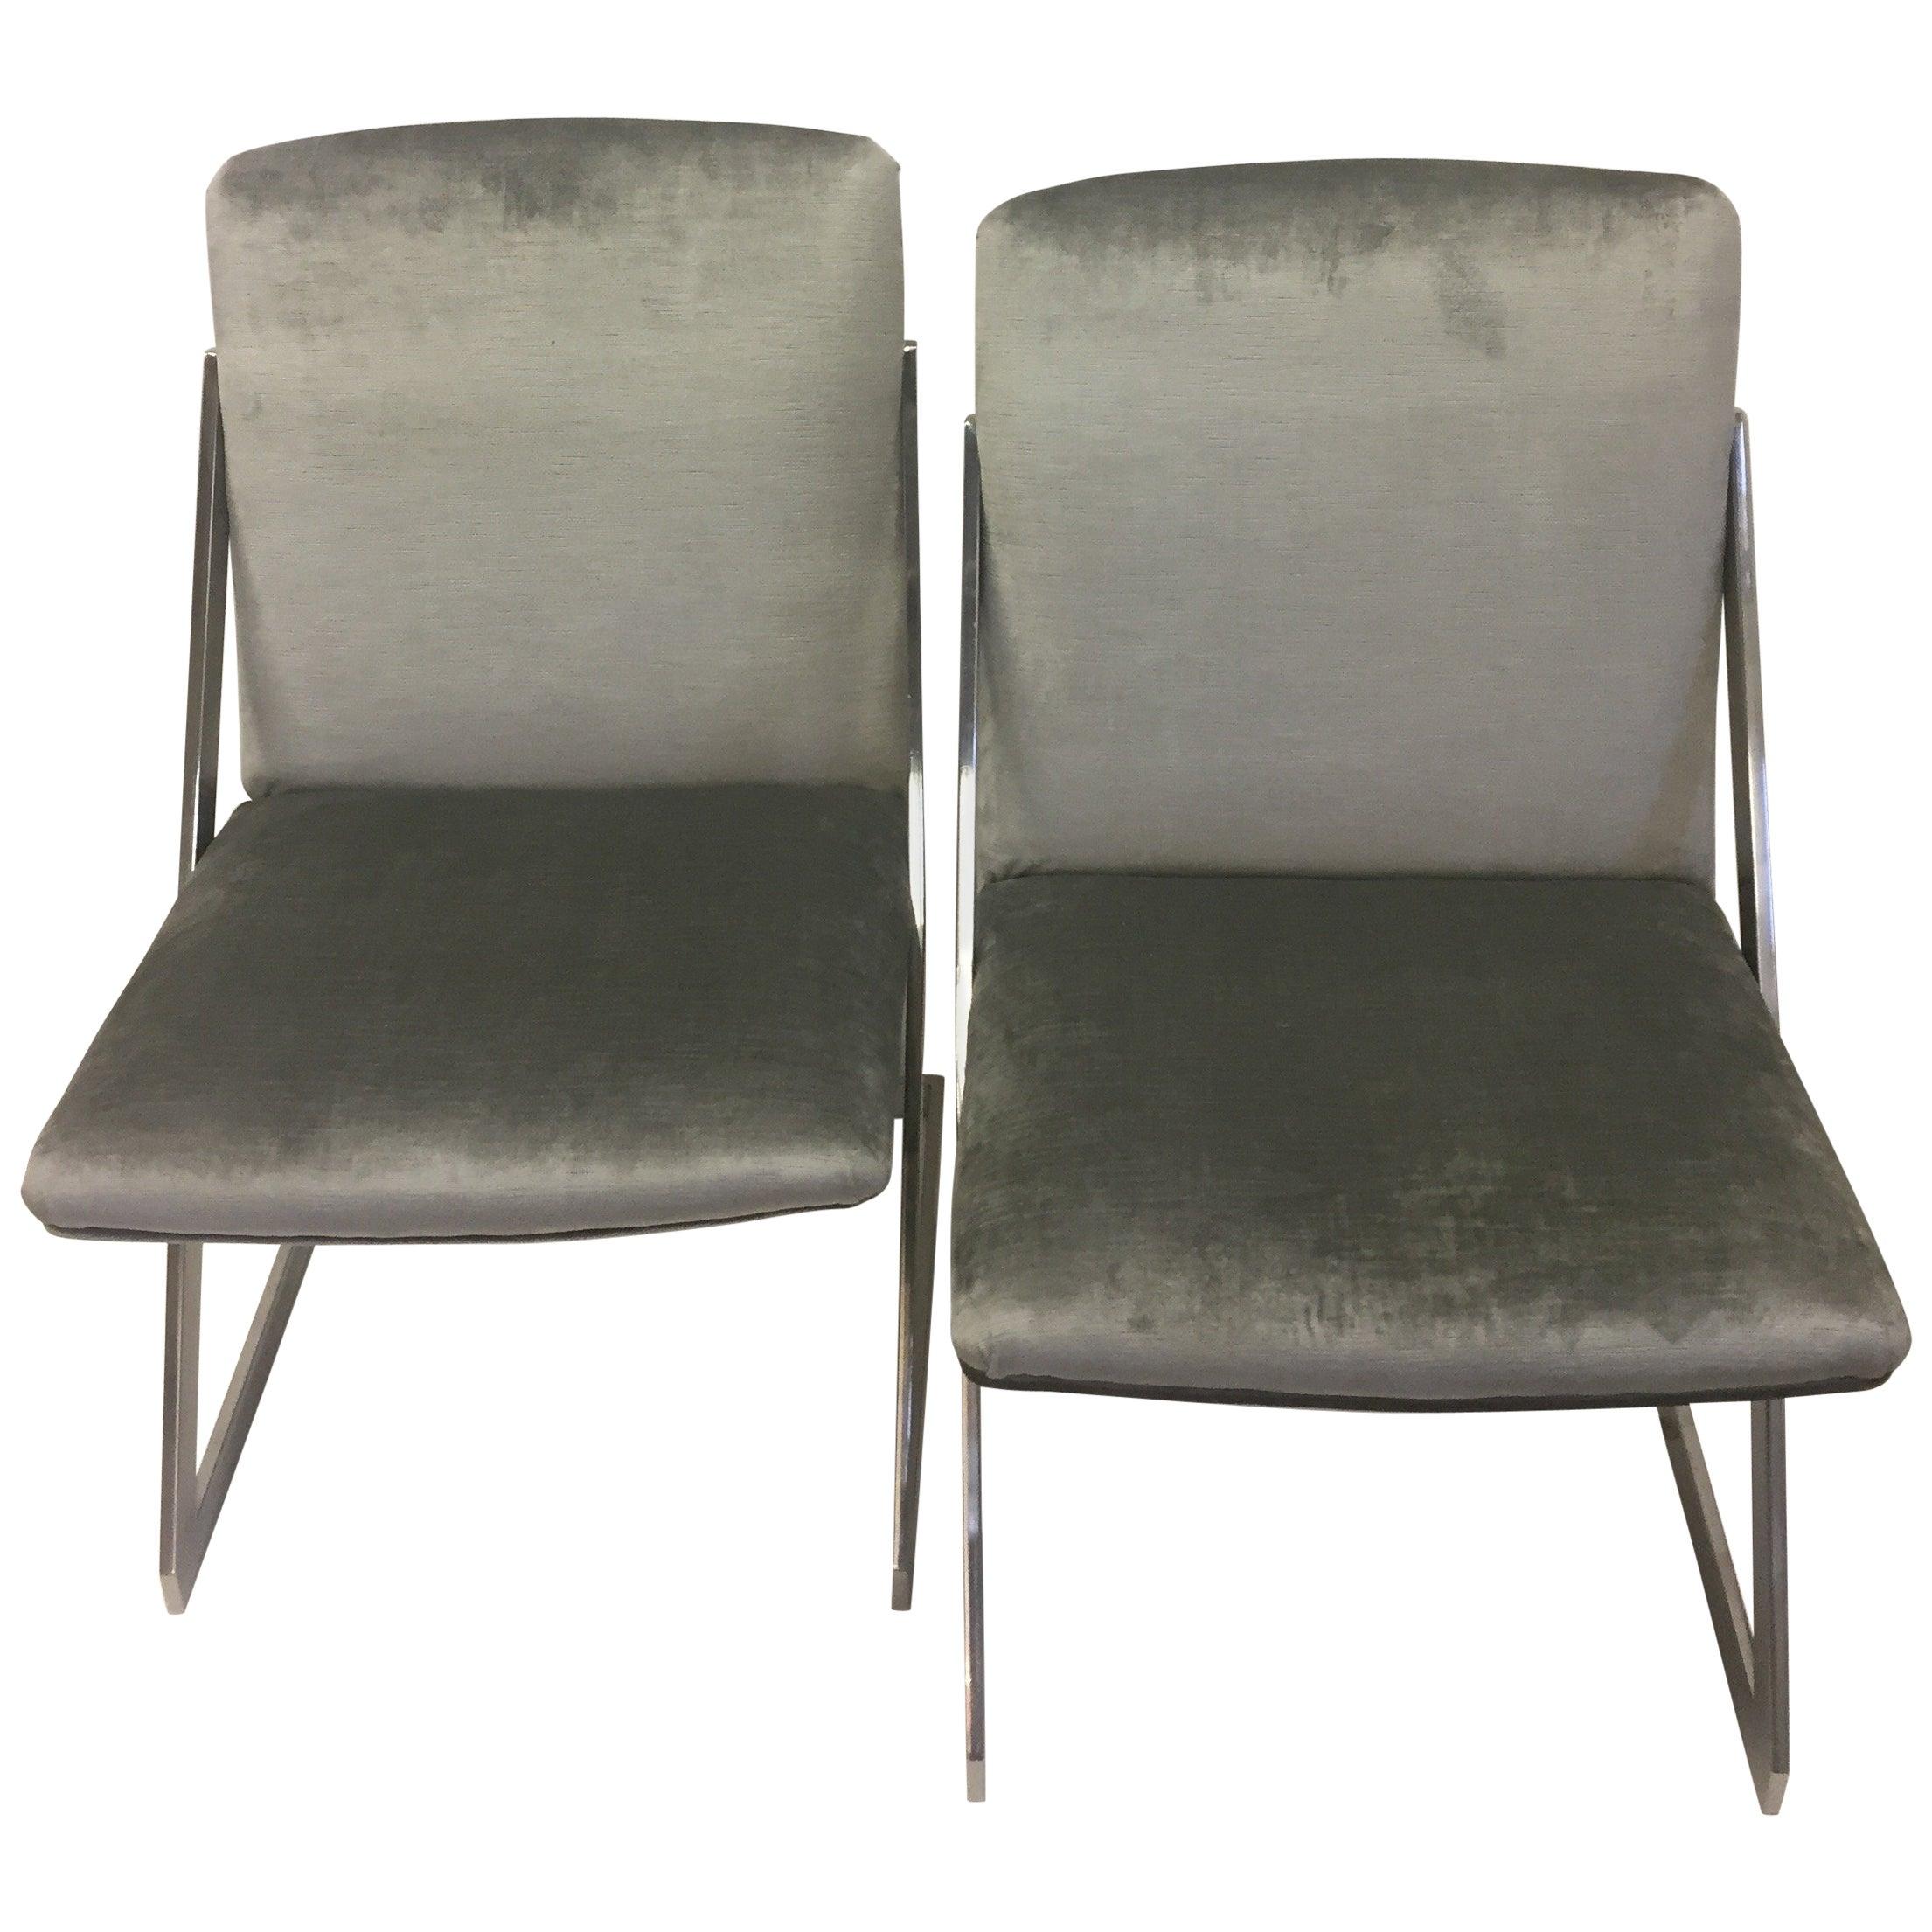 Sleek Pair of Mid-Century Modern Chrome and Gray Silk Velvet Club Chairs